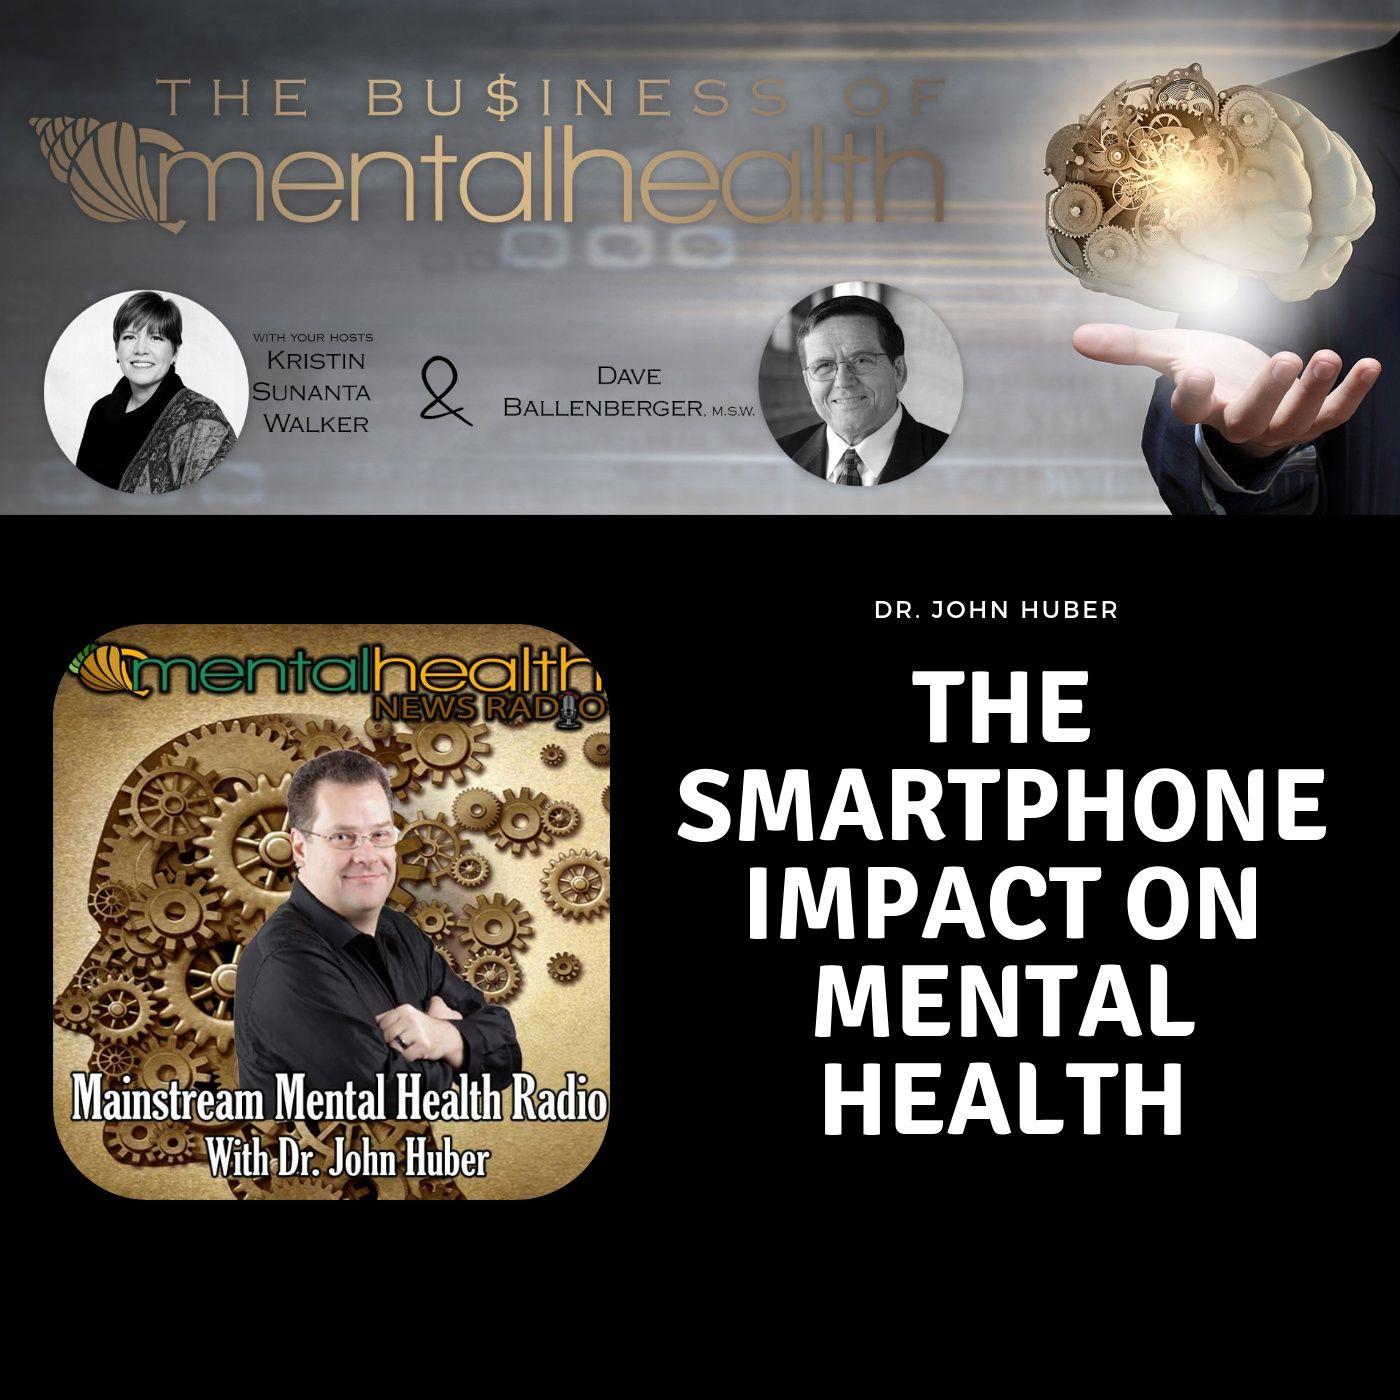 Mental Health News Radio - Mental Health Business: The Smartphone Impact